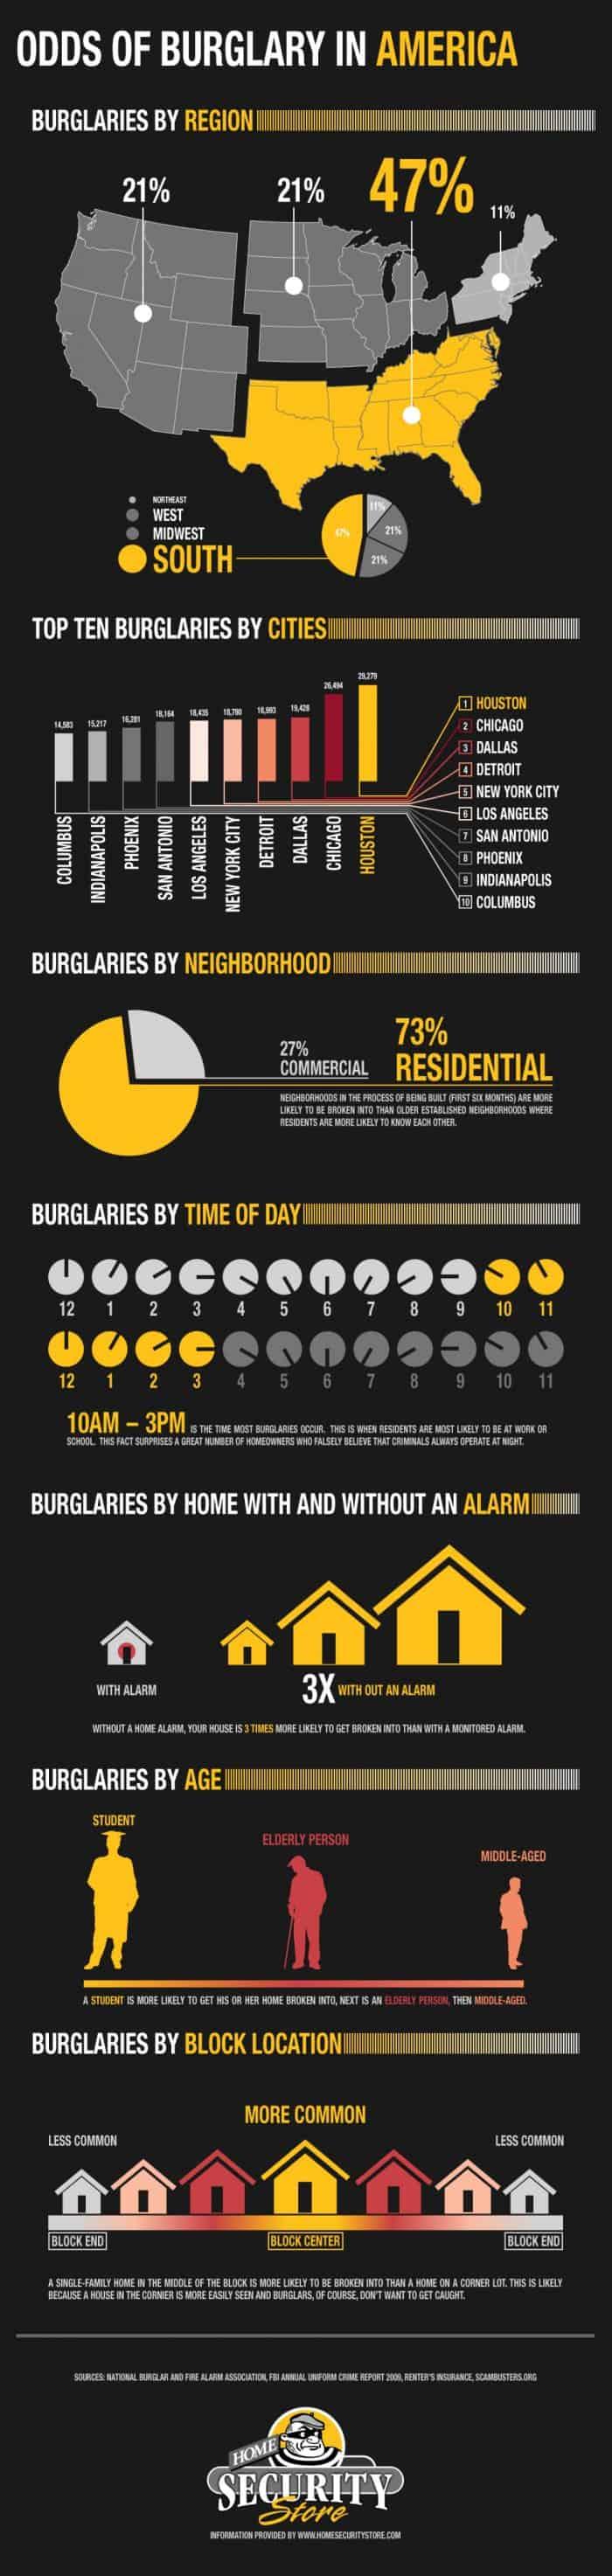 Odds of burglary in america infographic